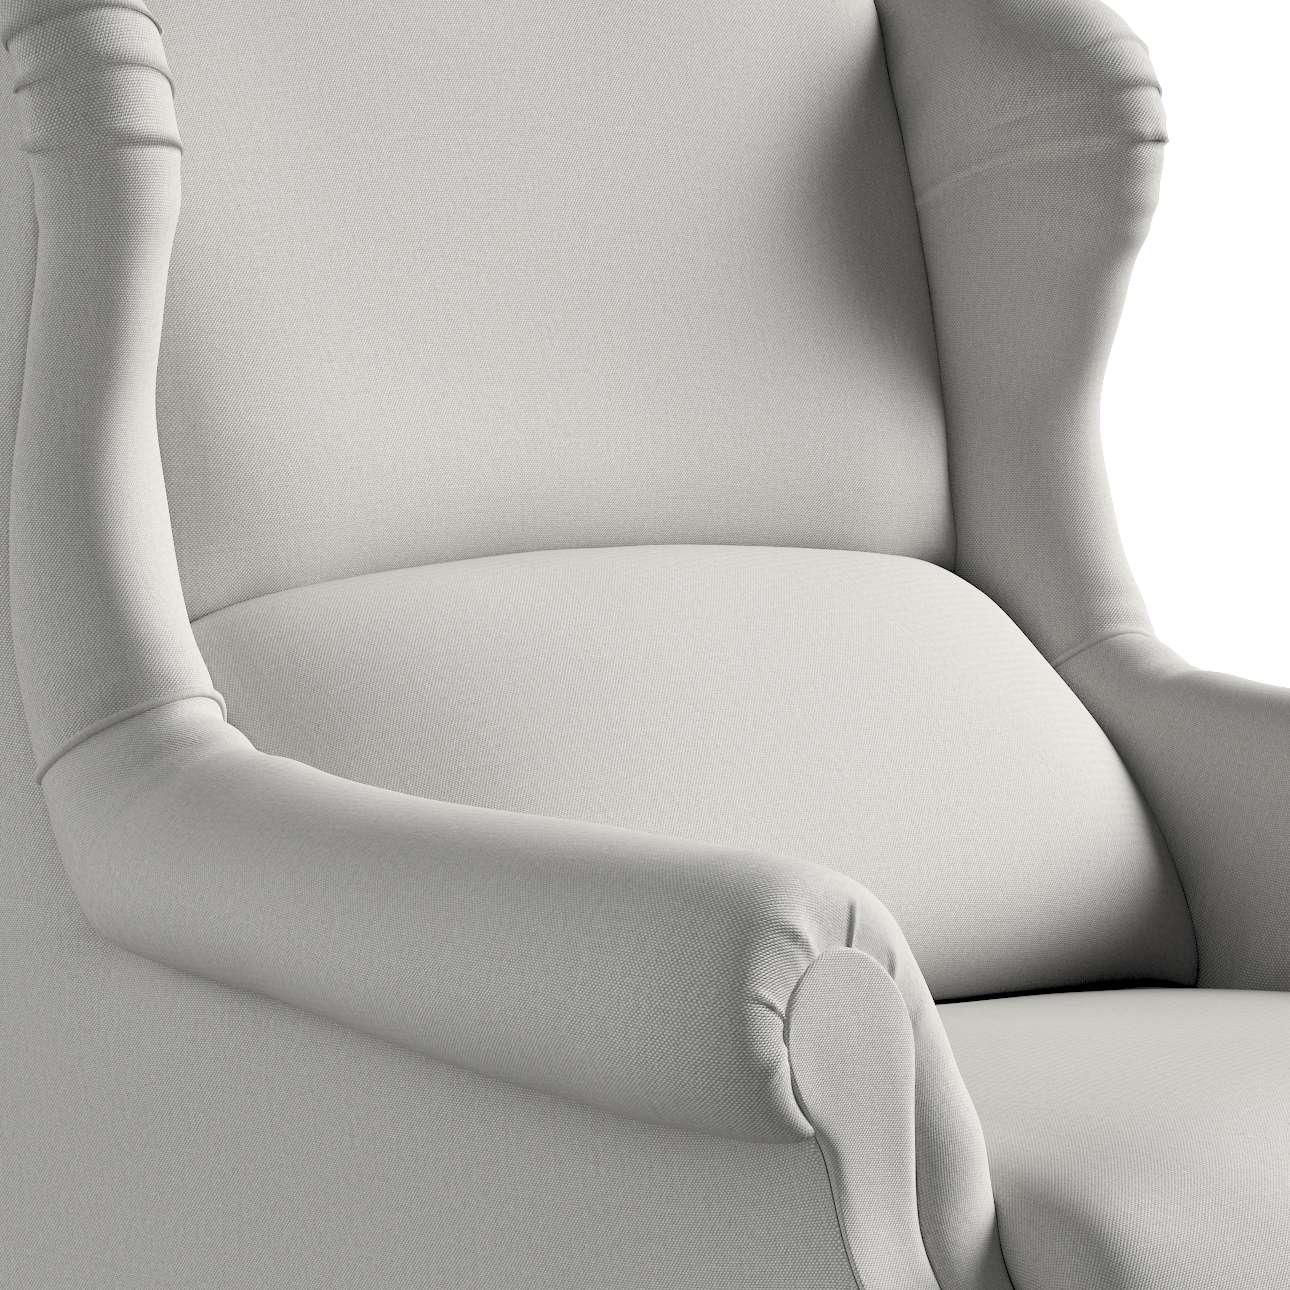 Fotel Unique w kolekcji Etna, tkanina: 705-90